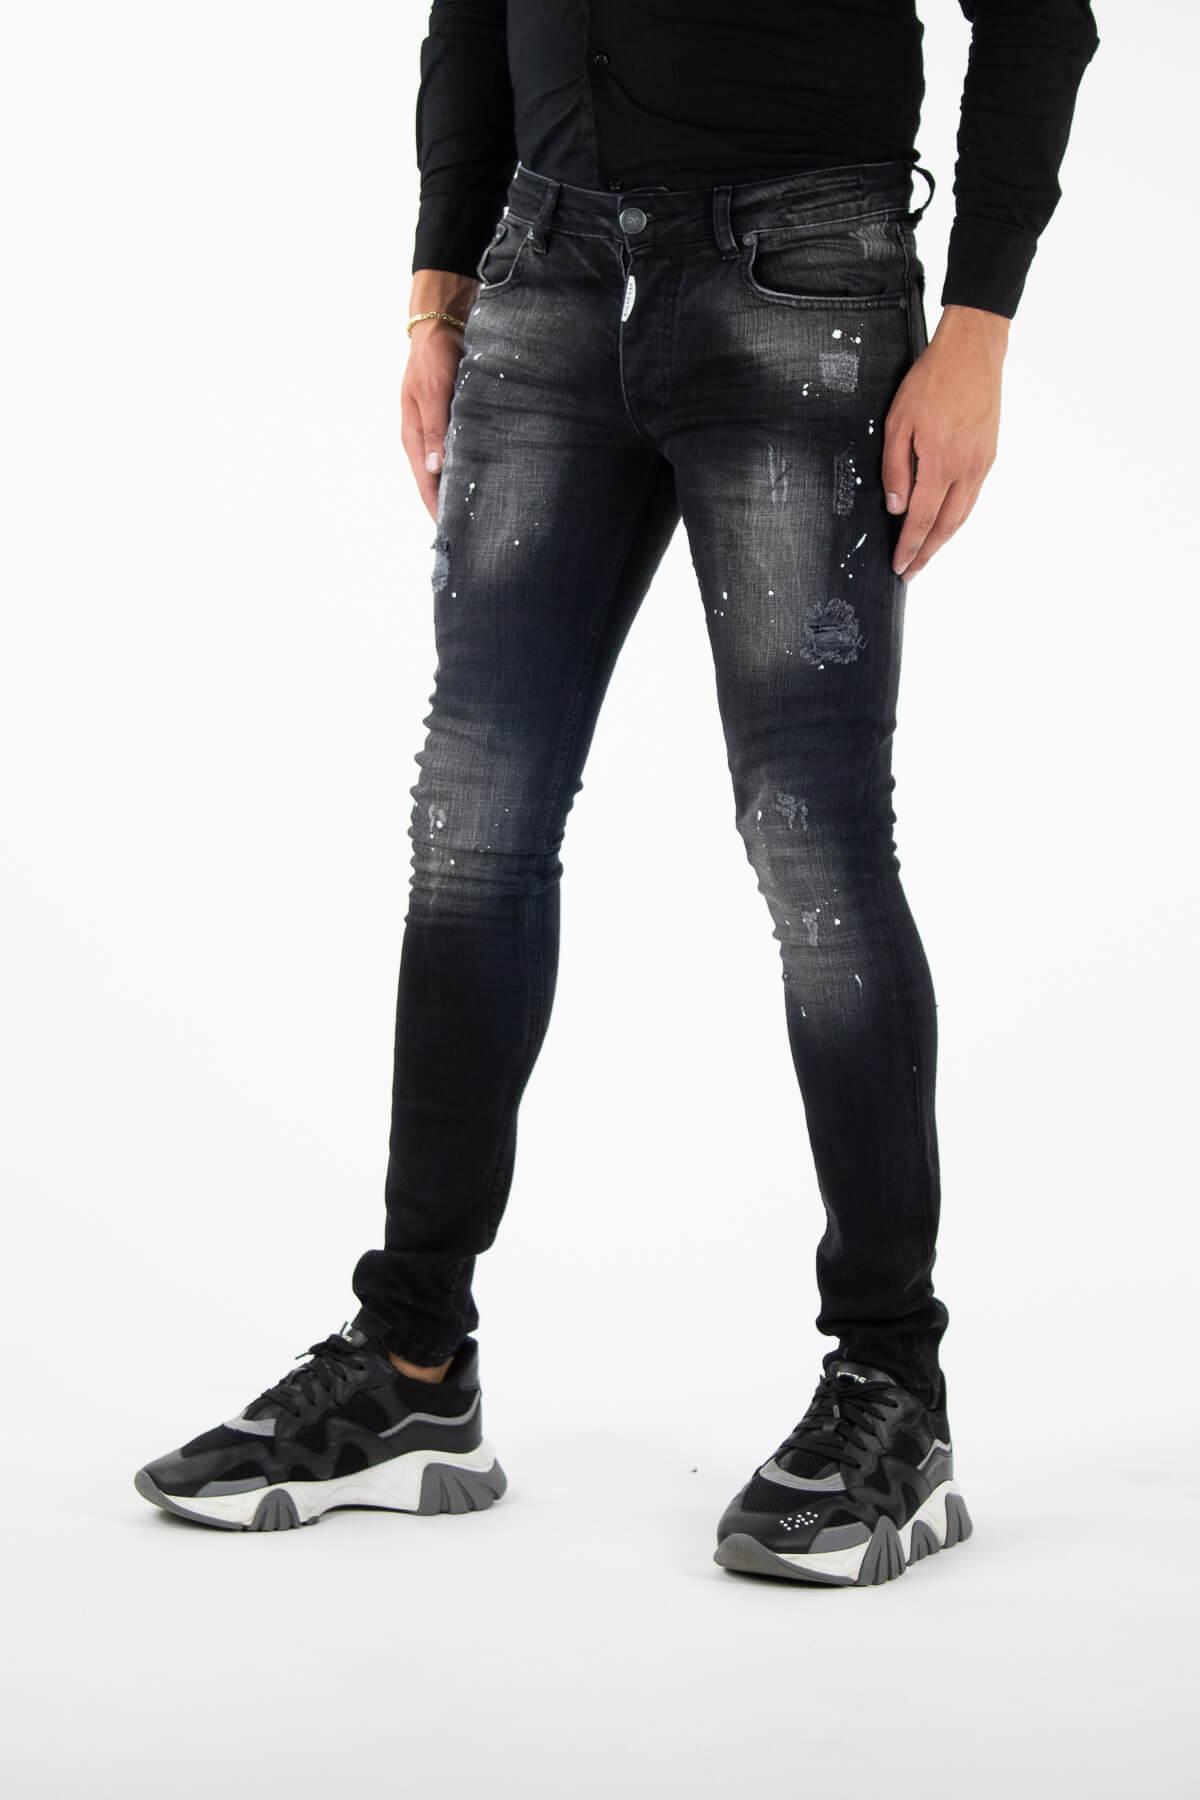 Alicante Deluxe Black Jeans-3